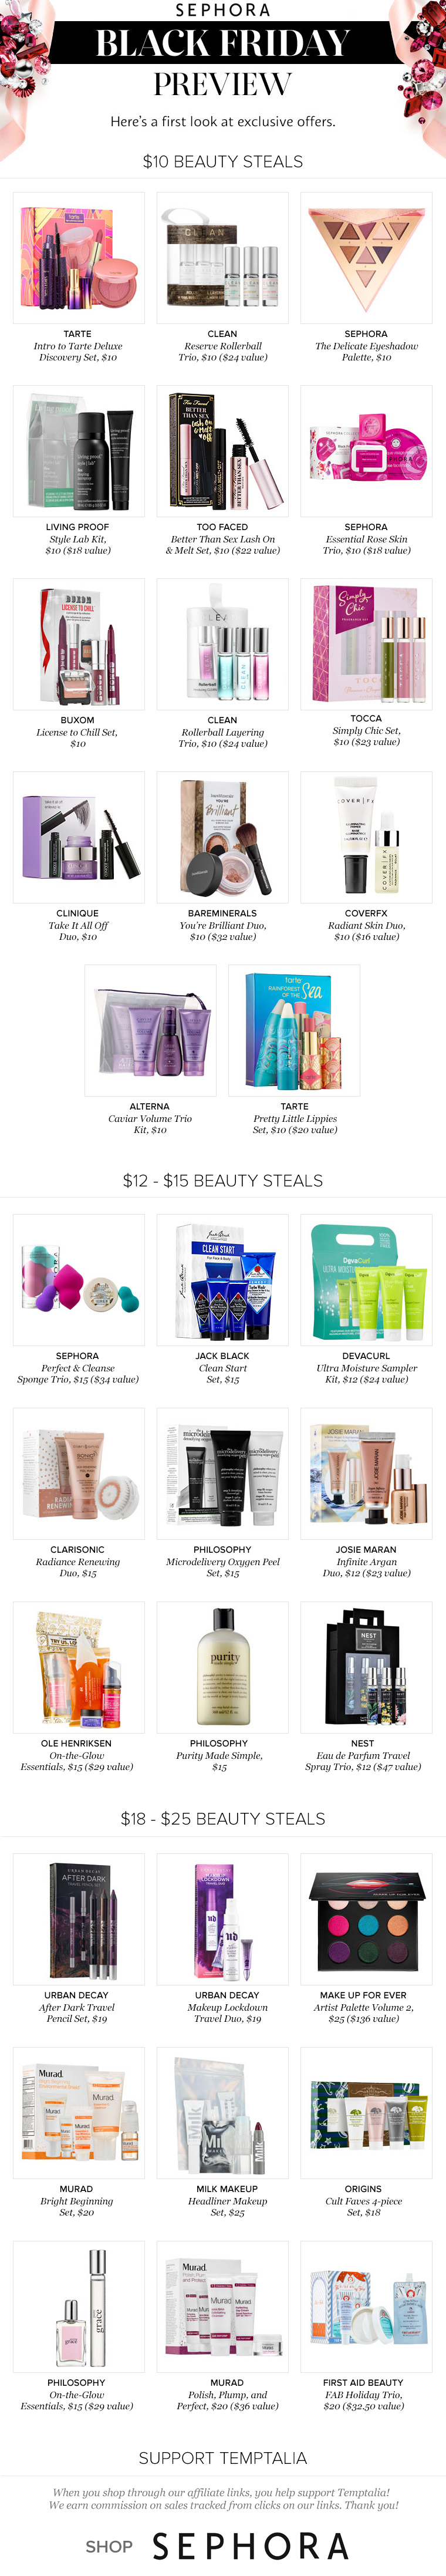 Sephora Black Friday 2016: $10, $15, $20 Deals